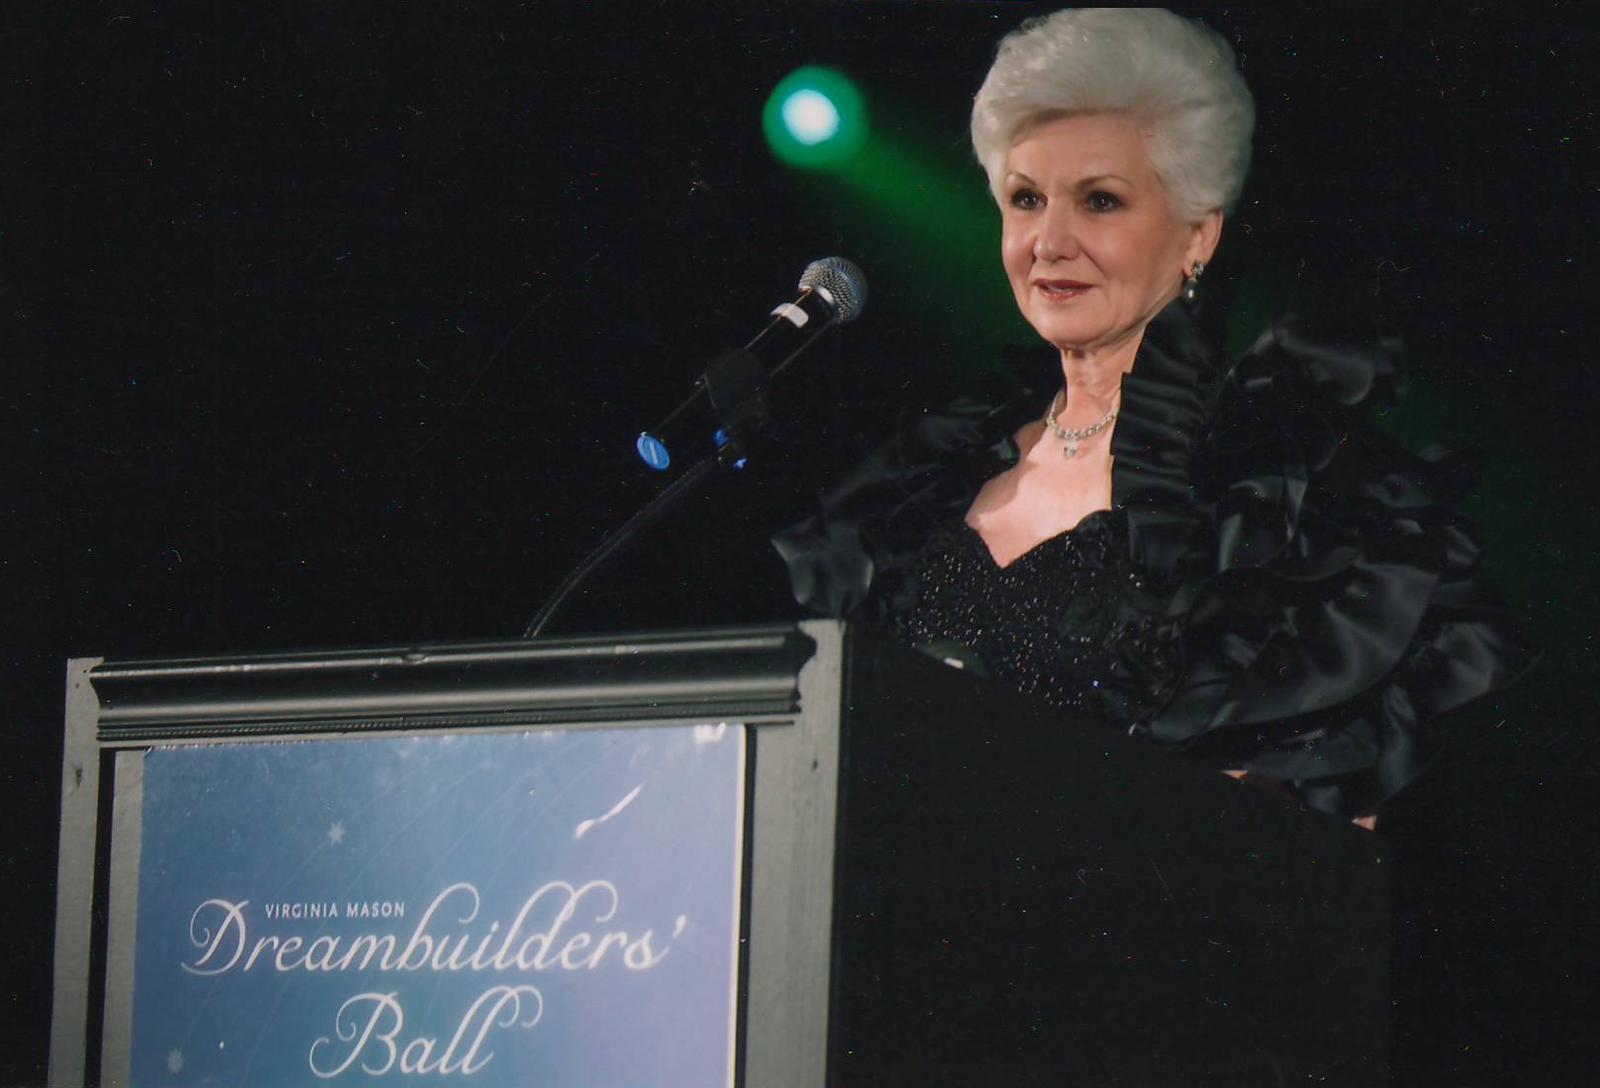 Becky speaking at the Virginia Mason Foundation Dreambuilder's Ball.